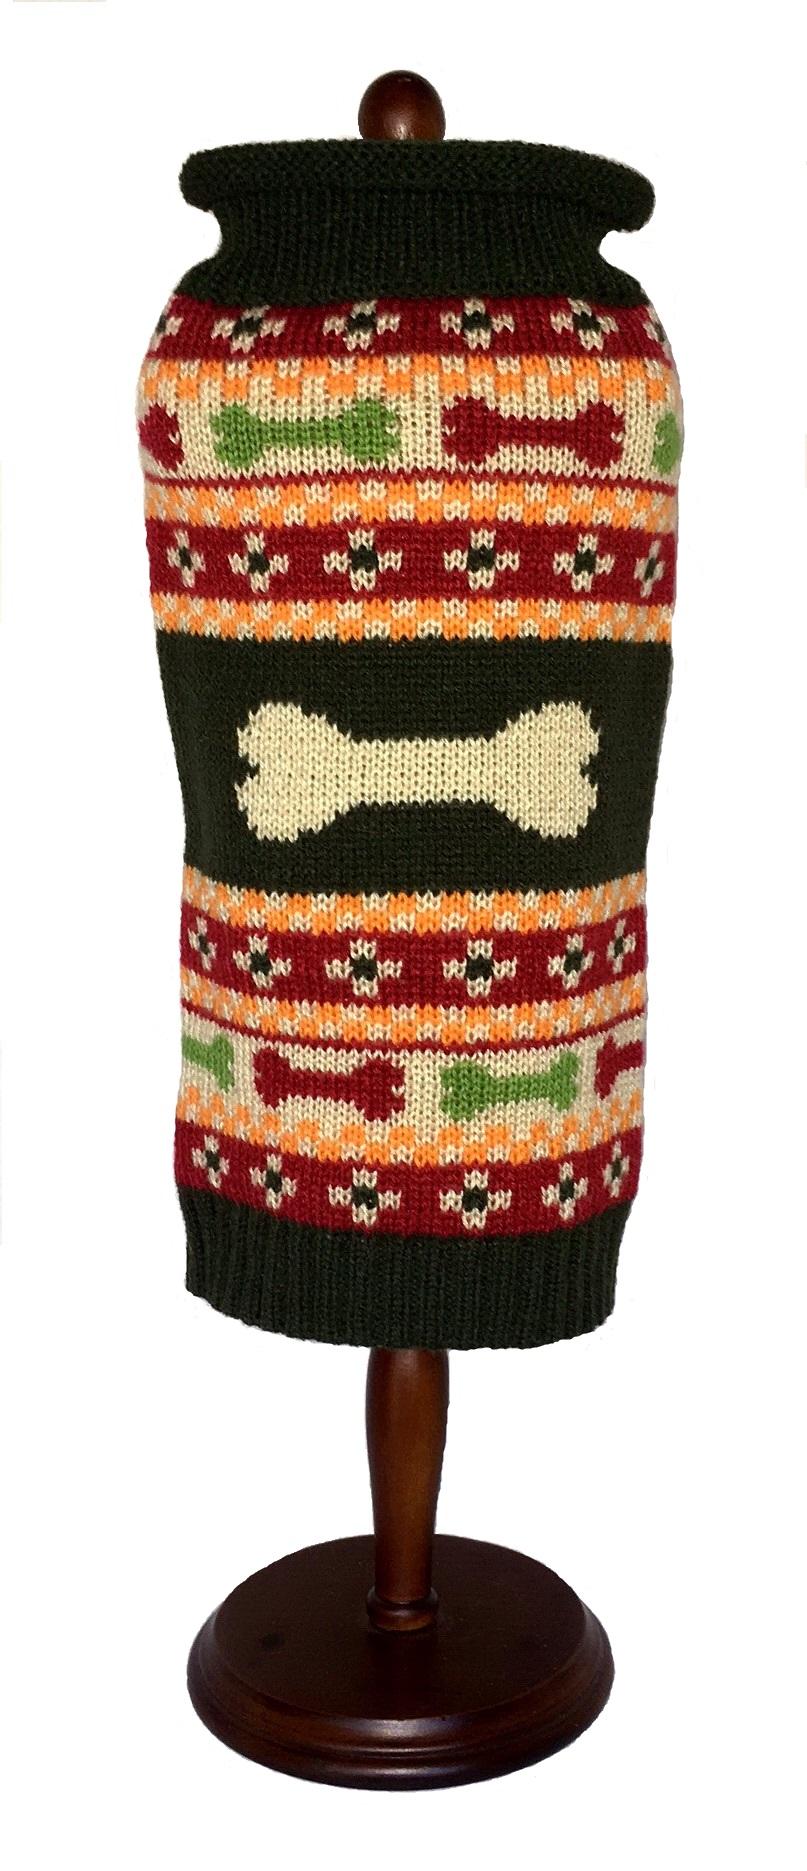 Dallas Dogs Sweater, Fair Isle Bones, 8-in